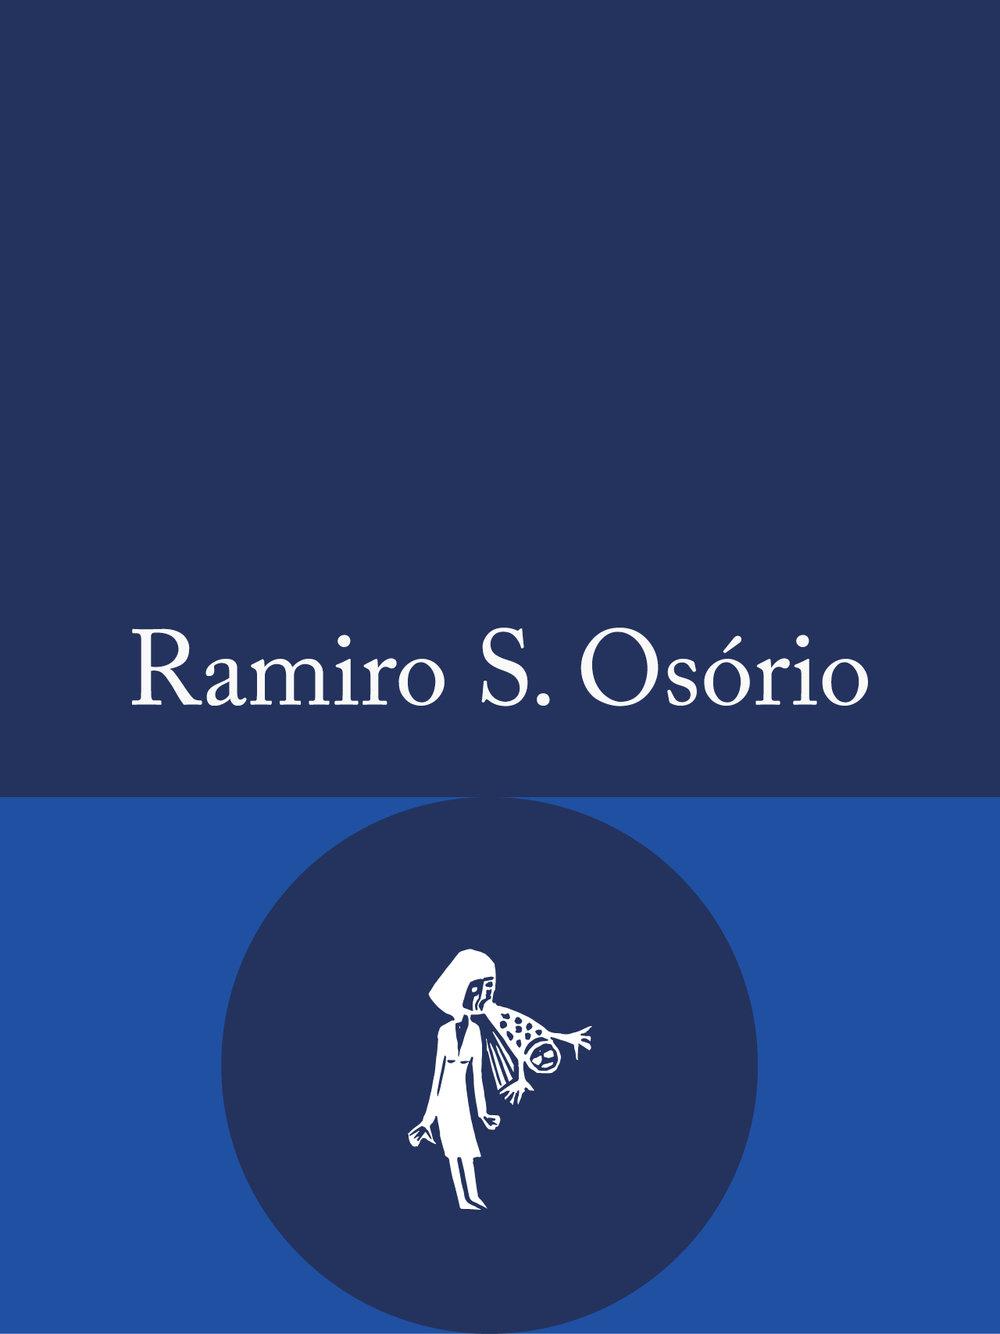 RamiroSOsorio.jpg